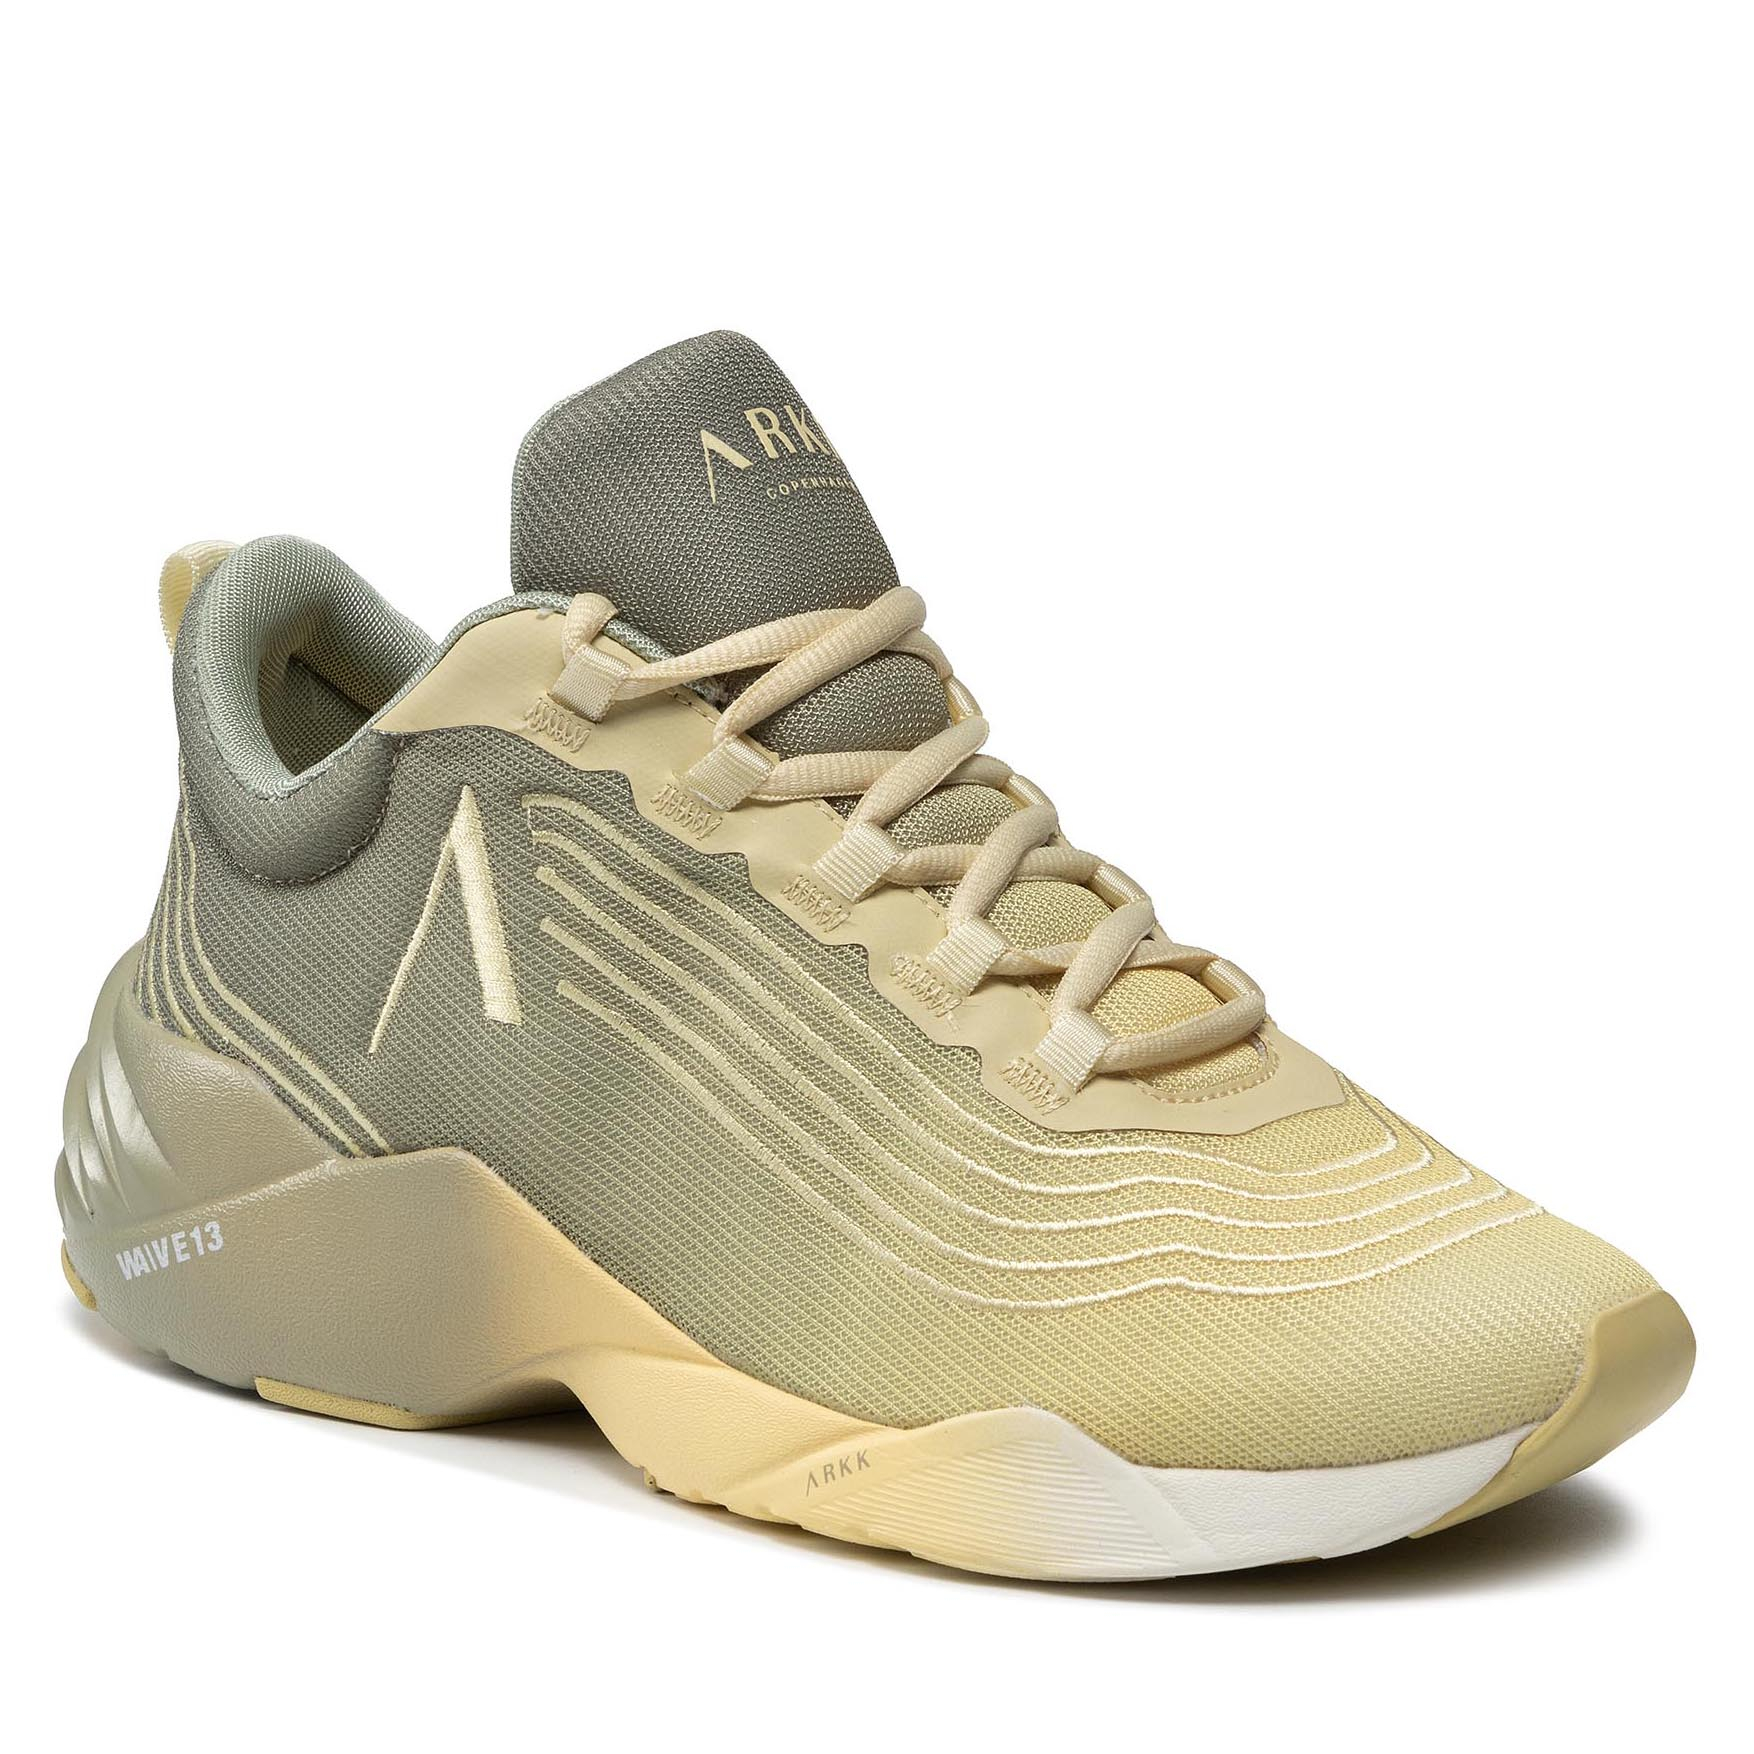 Image of Sneakers ARKK COPENHAGEN - Avory Mesh W13 CO4913-0284-M Desert Sage Mellow Yellow